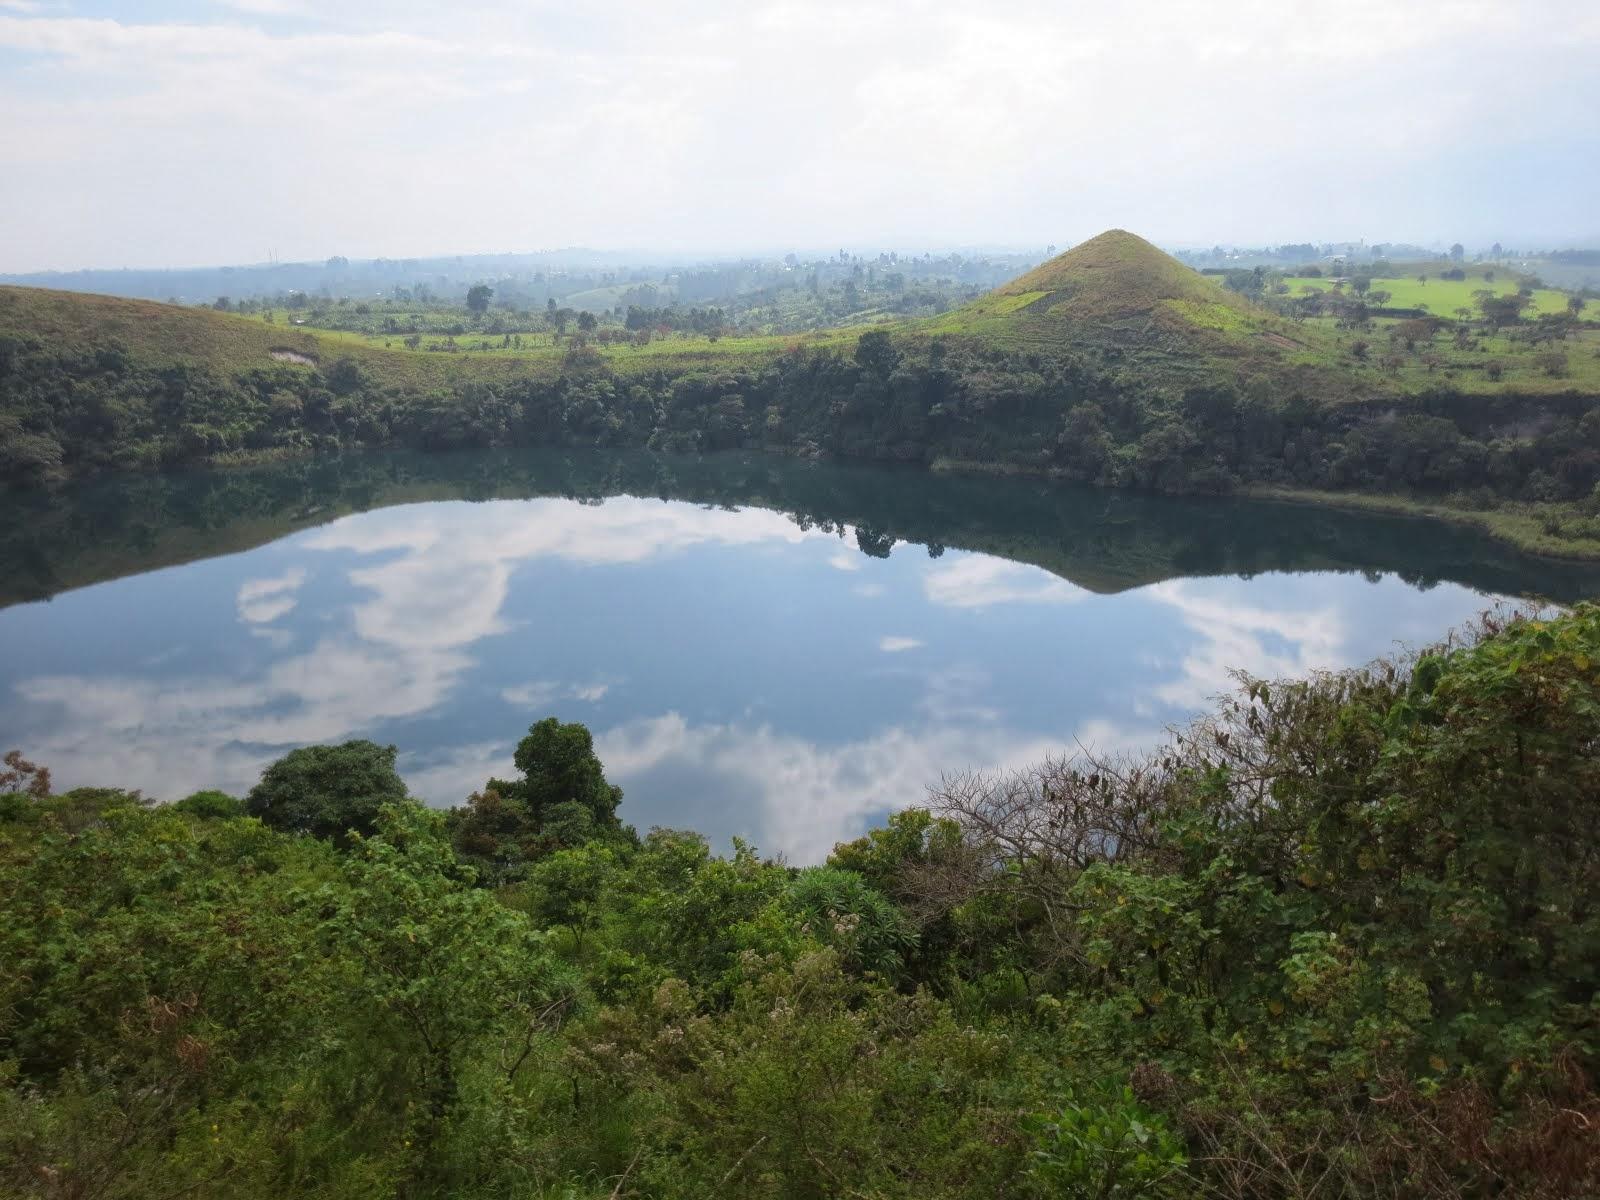 Crater Lake in Ft. Portal, Uganda